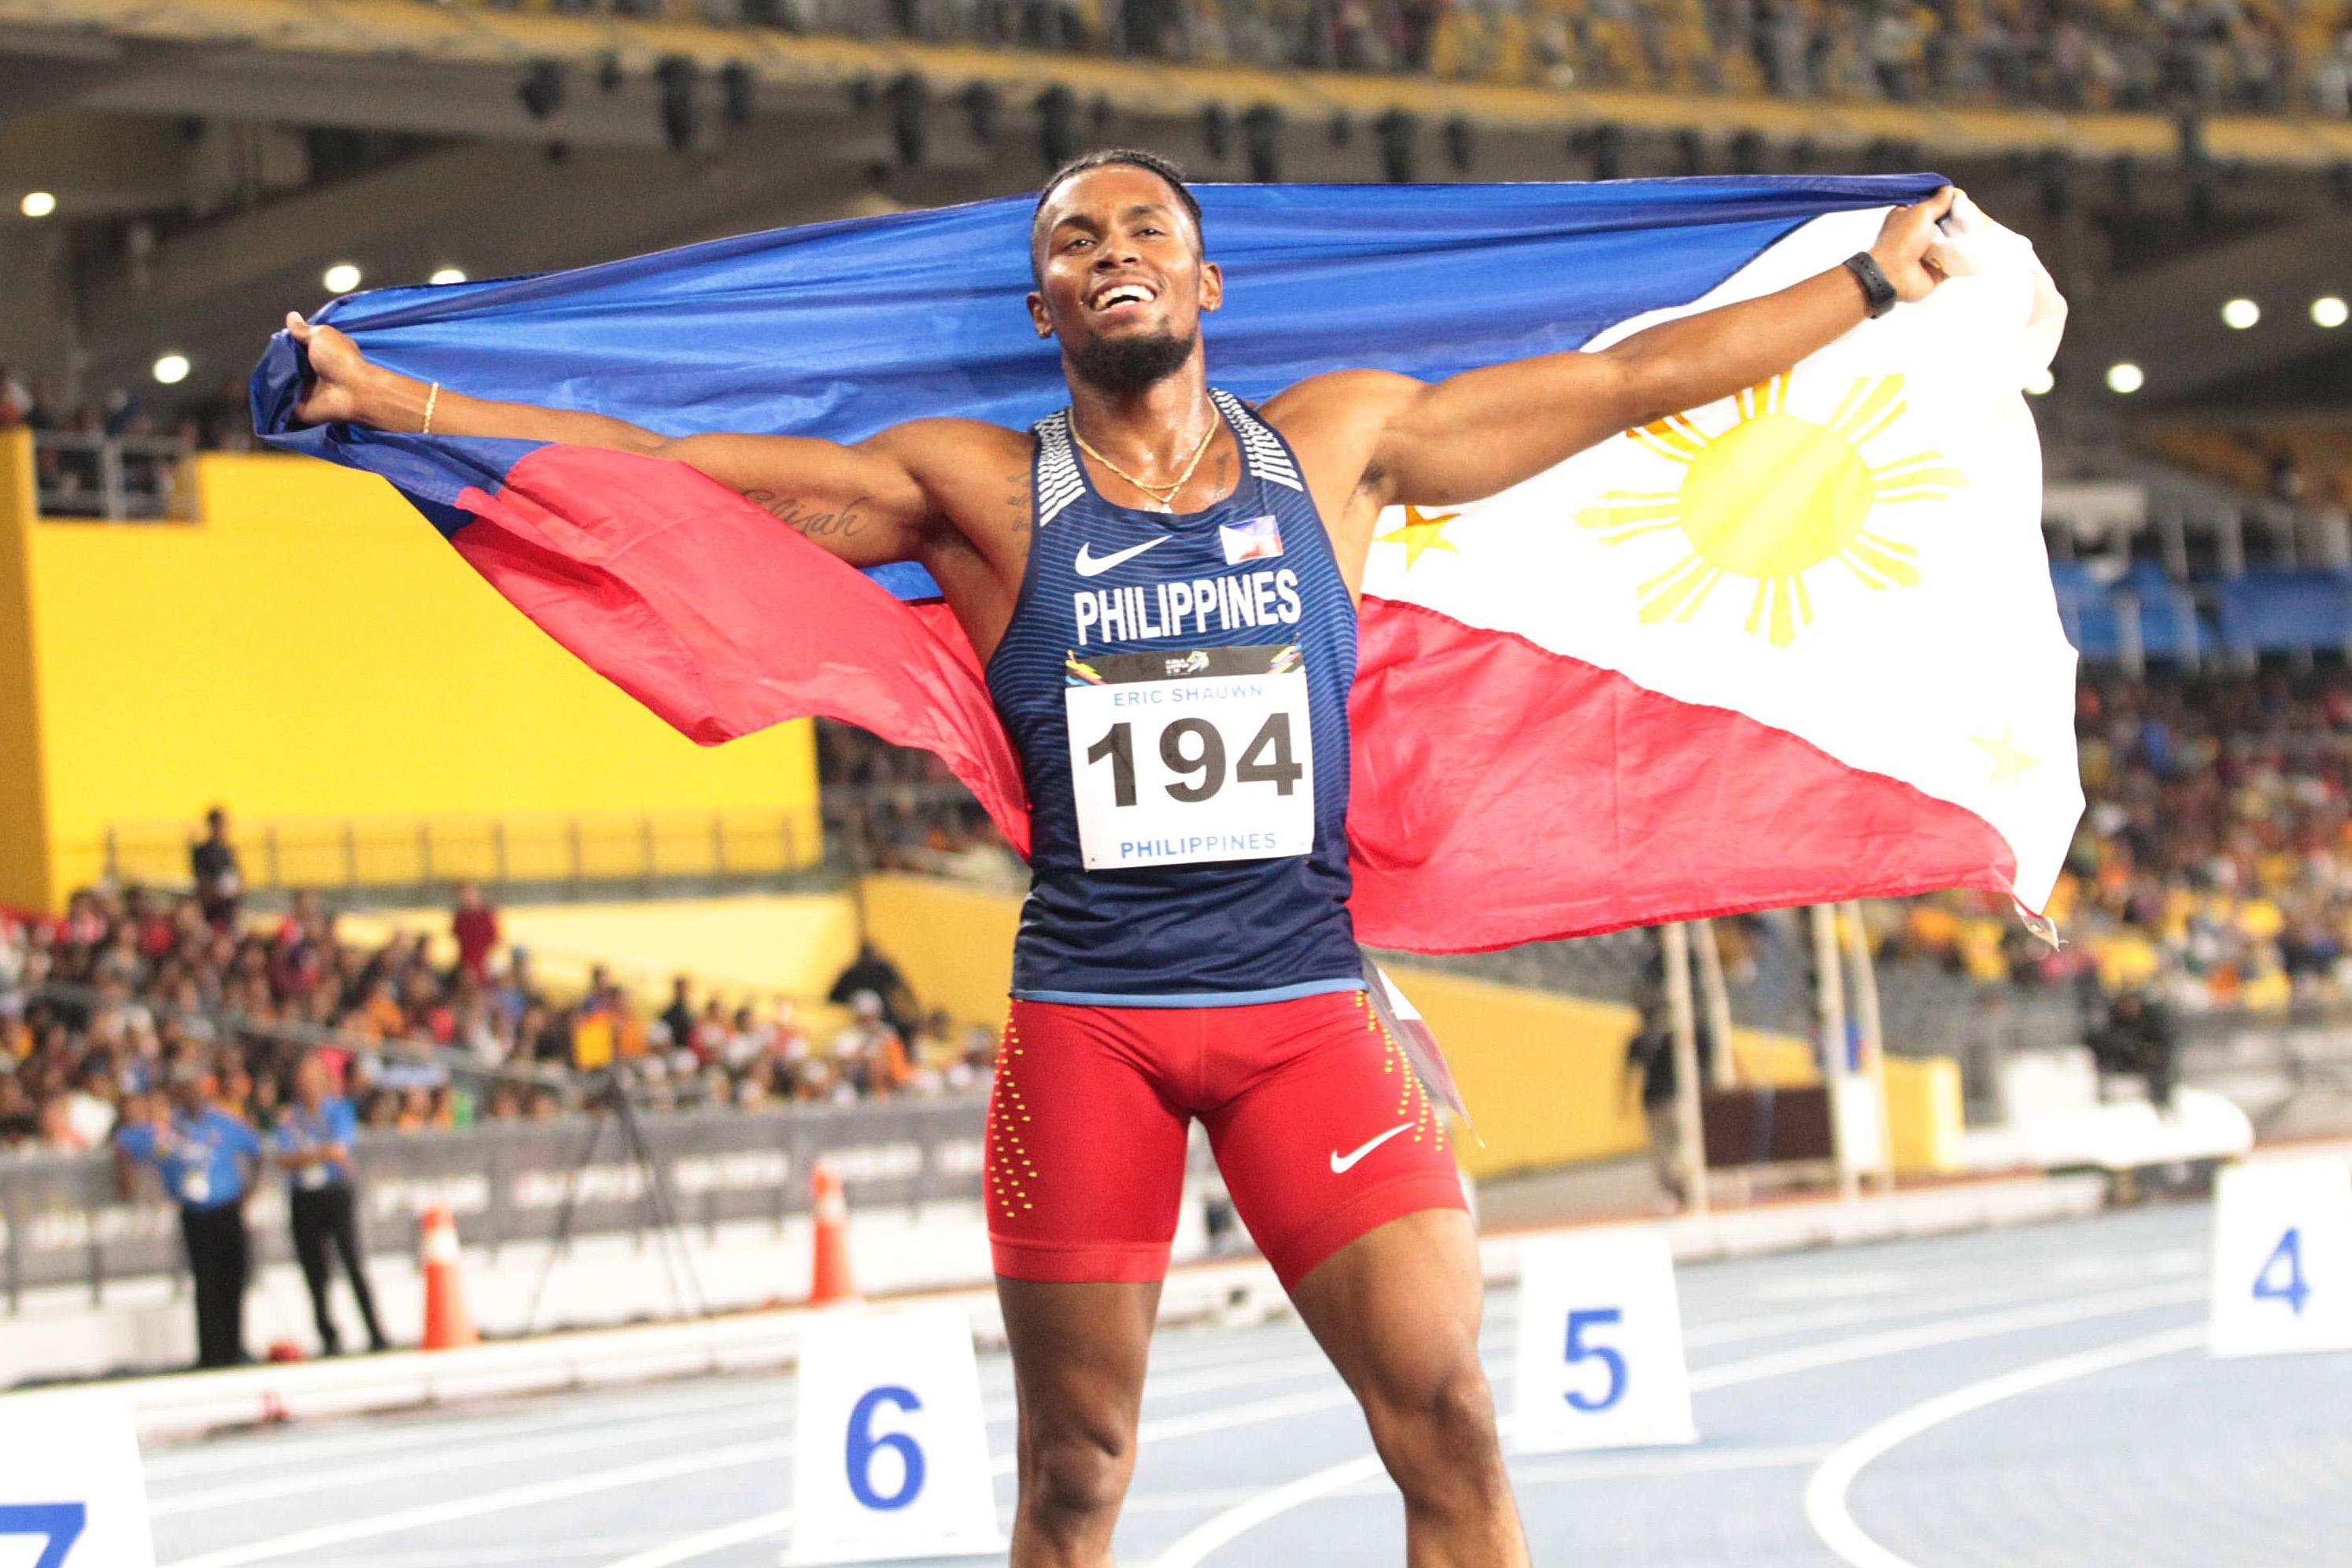 Khairul Hafiz conquers Southeast Asia with 100m gold